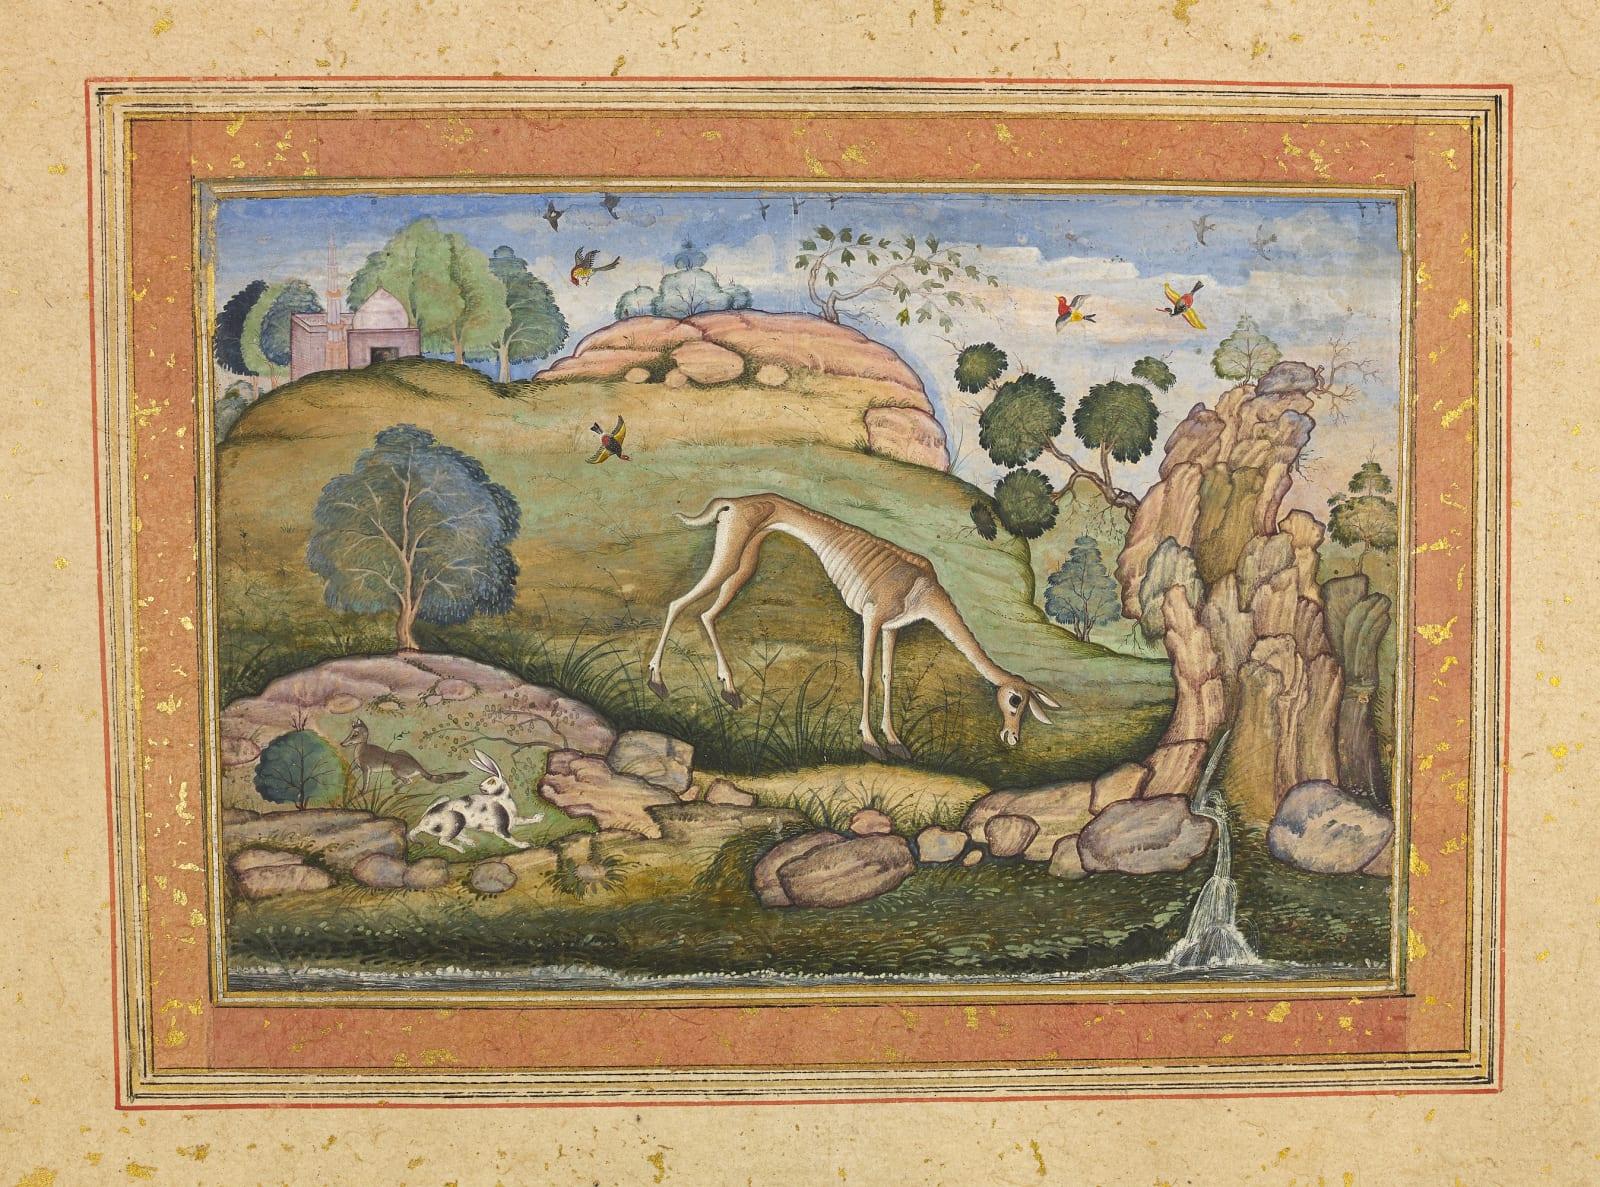 An emaciated Deer heads for Water, Imperial Mughal artist, c. 1585–90